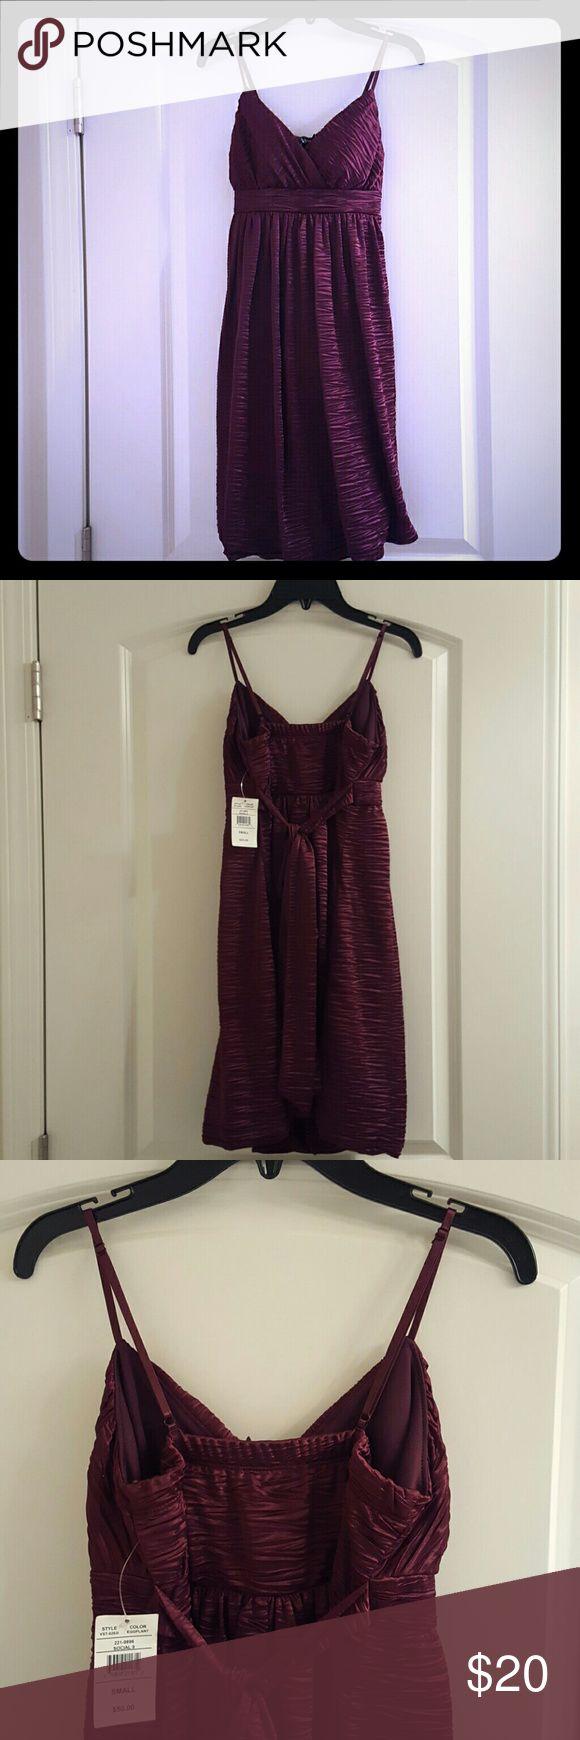 Selling this Women's semi-formal dress on Poshmark! My username is: vintage82. #shopmycloset #poshmark #fashion #shopping #style #forsale #Ruby Rox #Dresses & Skirts